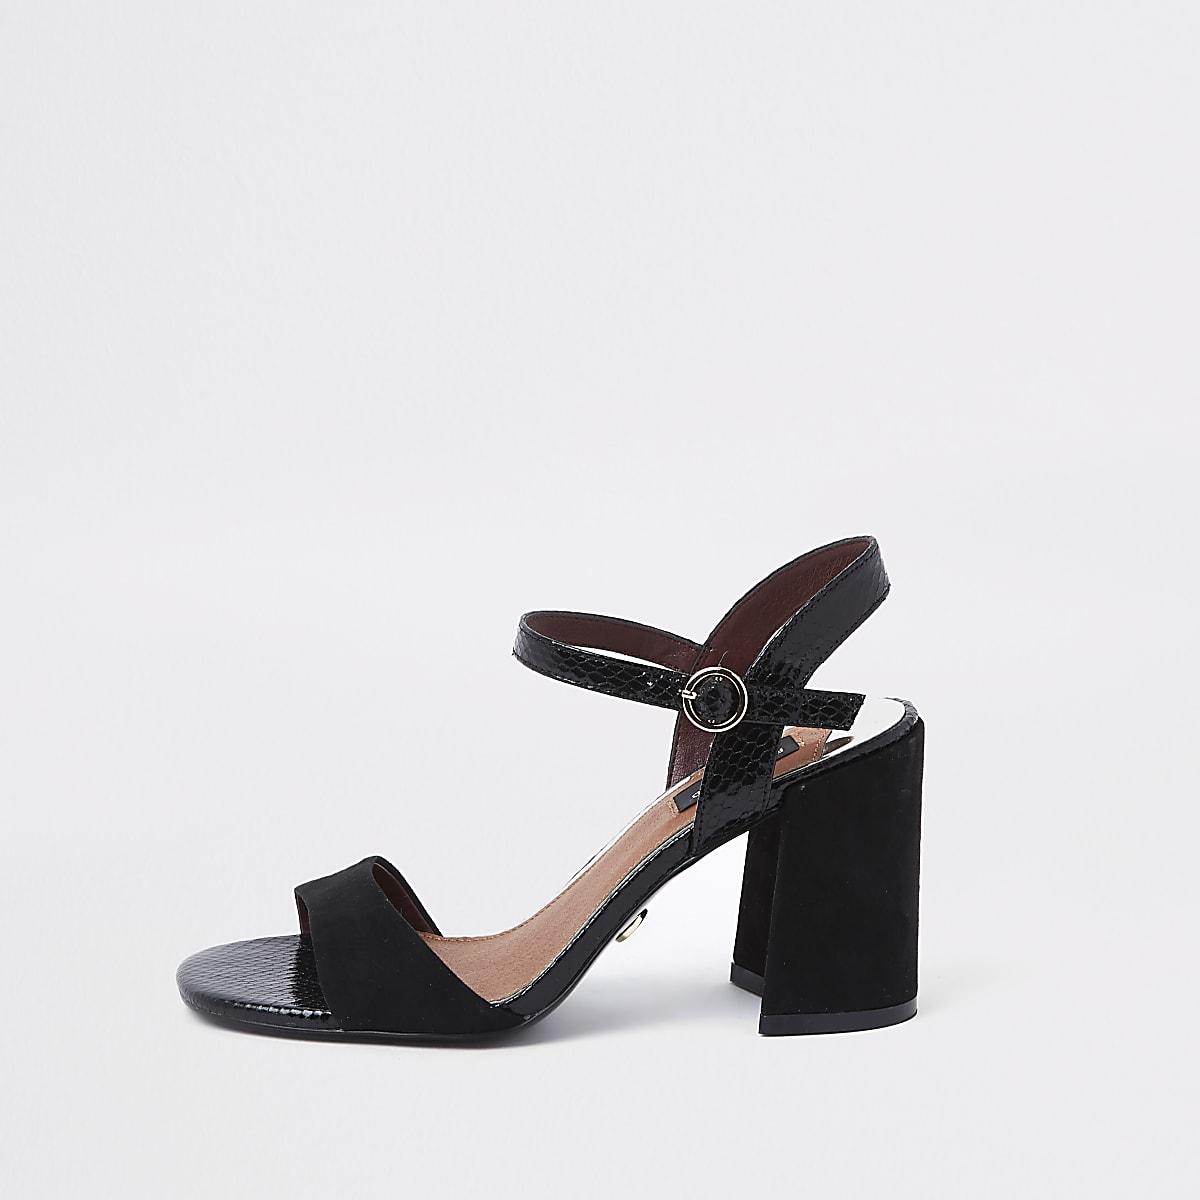 7fc7546da Black croc wide fit block heel sandals - Sandals - Shoes   Boots - women